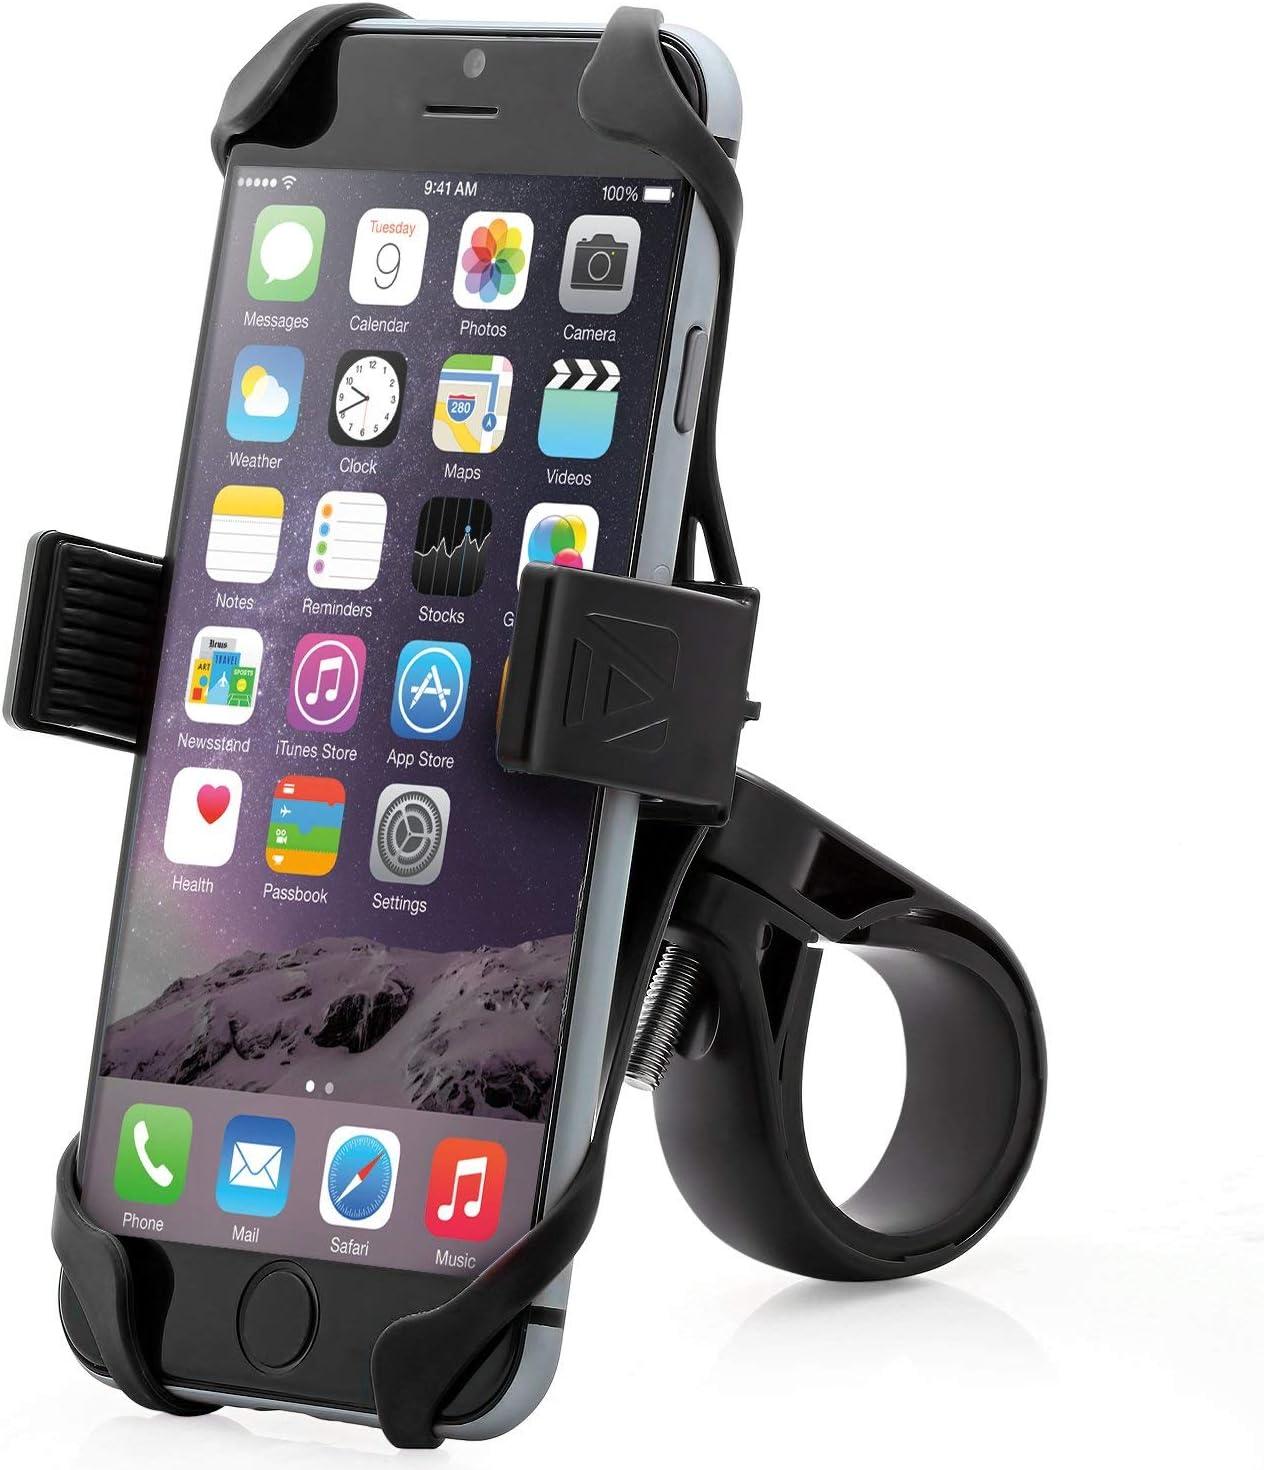 Aduro U-Grip Plus Universal Bike All items Award free shipping for Handleb - Motorcycle Mount